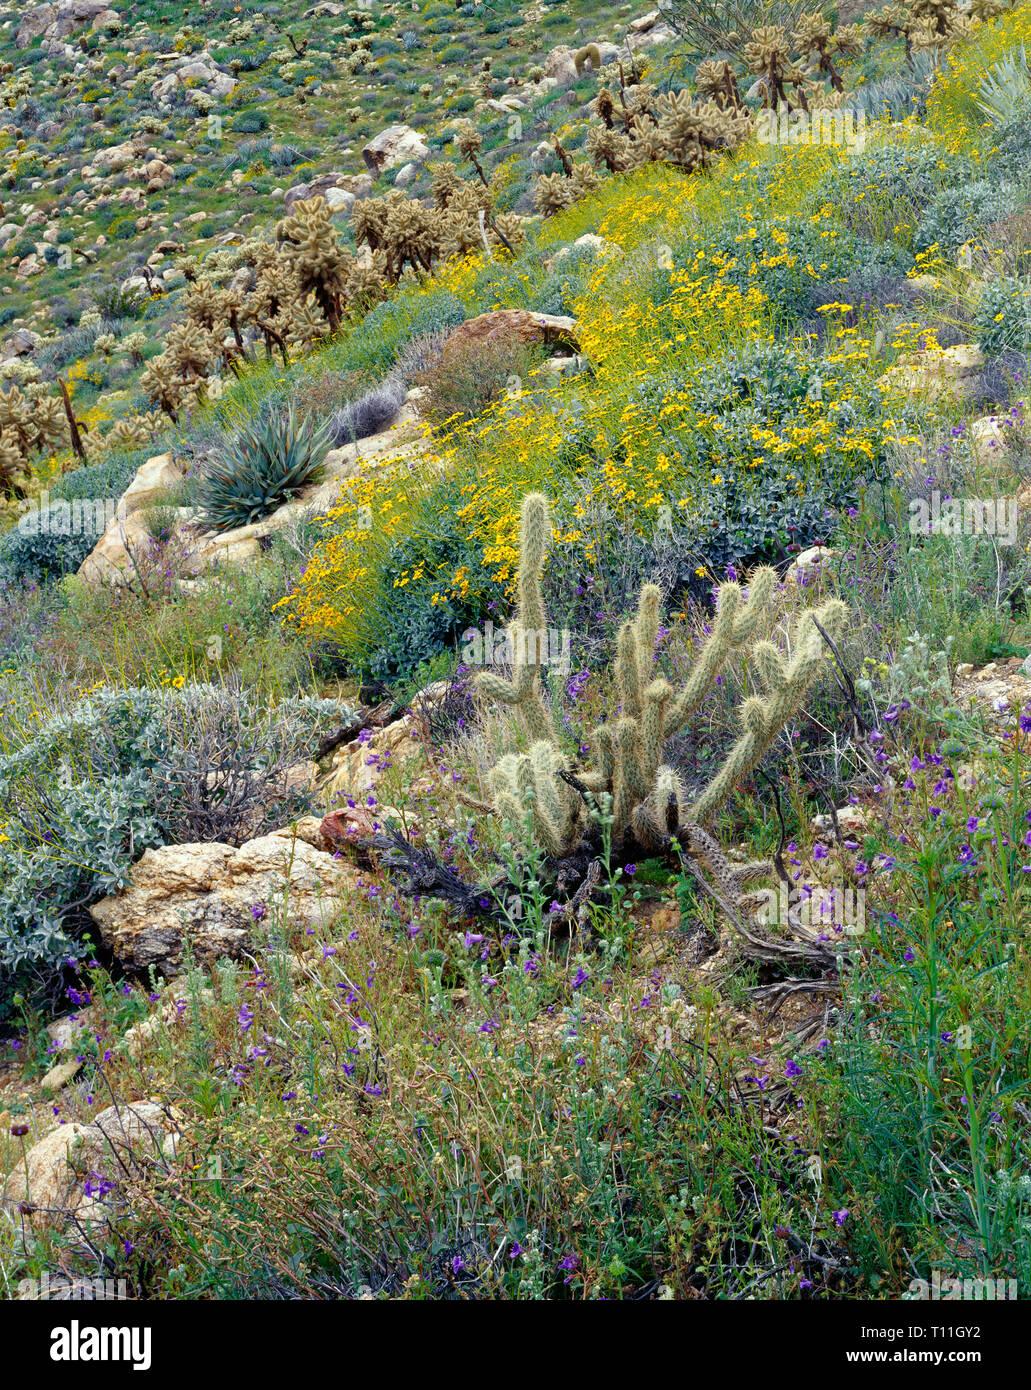 USA, California, Anza Borrego Desert State Park, Notch-leaved phacelia and brittlebush bloom among teddybear cholla in Mason Valley. Stock Photo